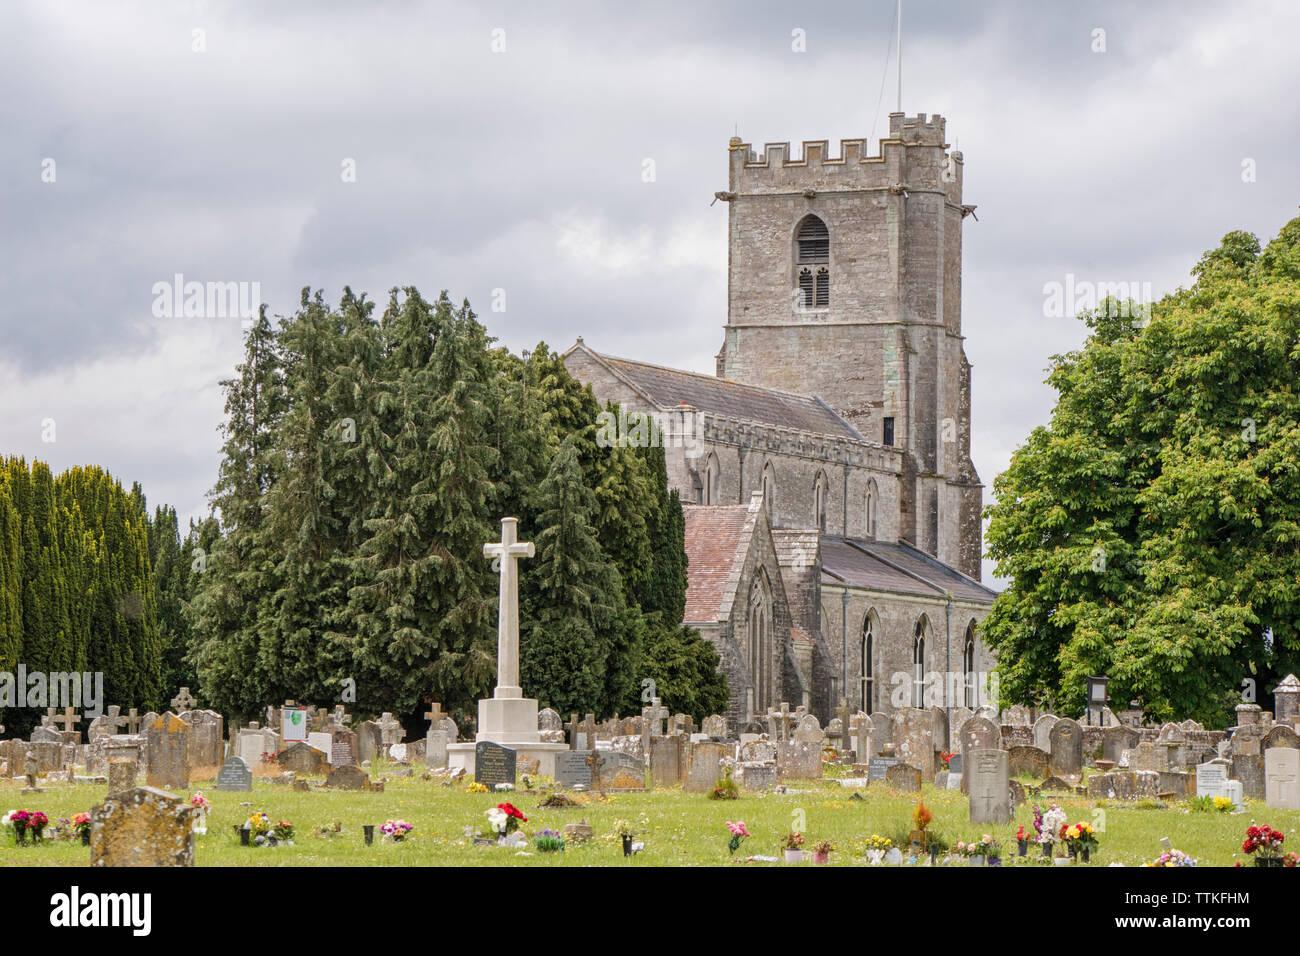 Lady St. Mary Church in historic Wareham, Dorset, England, UK - Stock Image